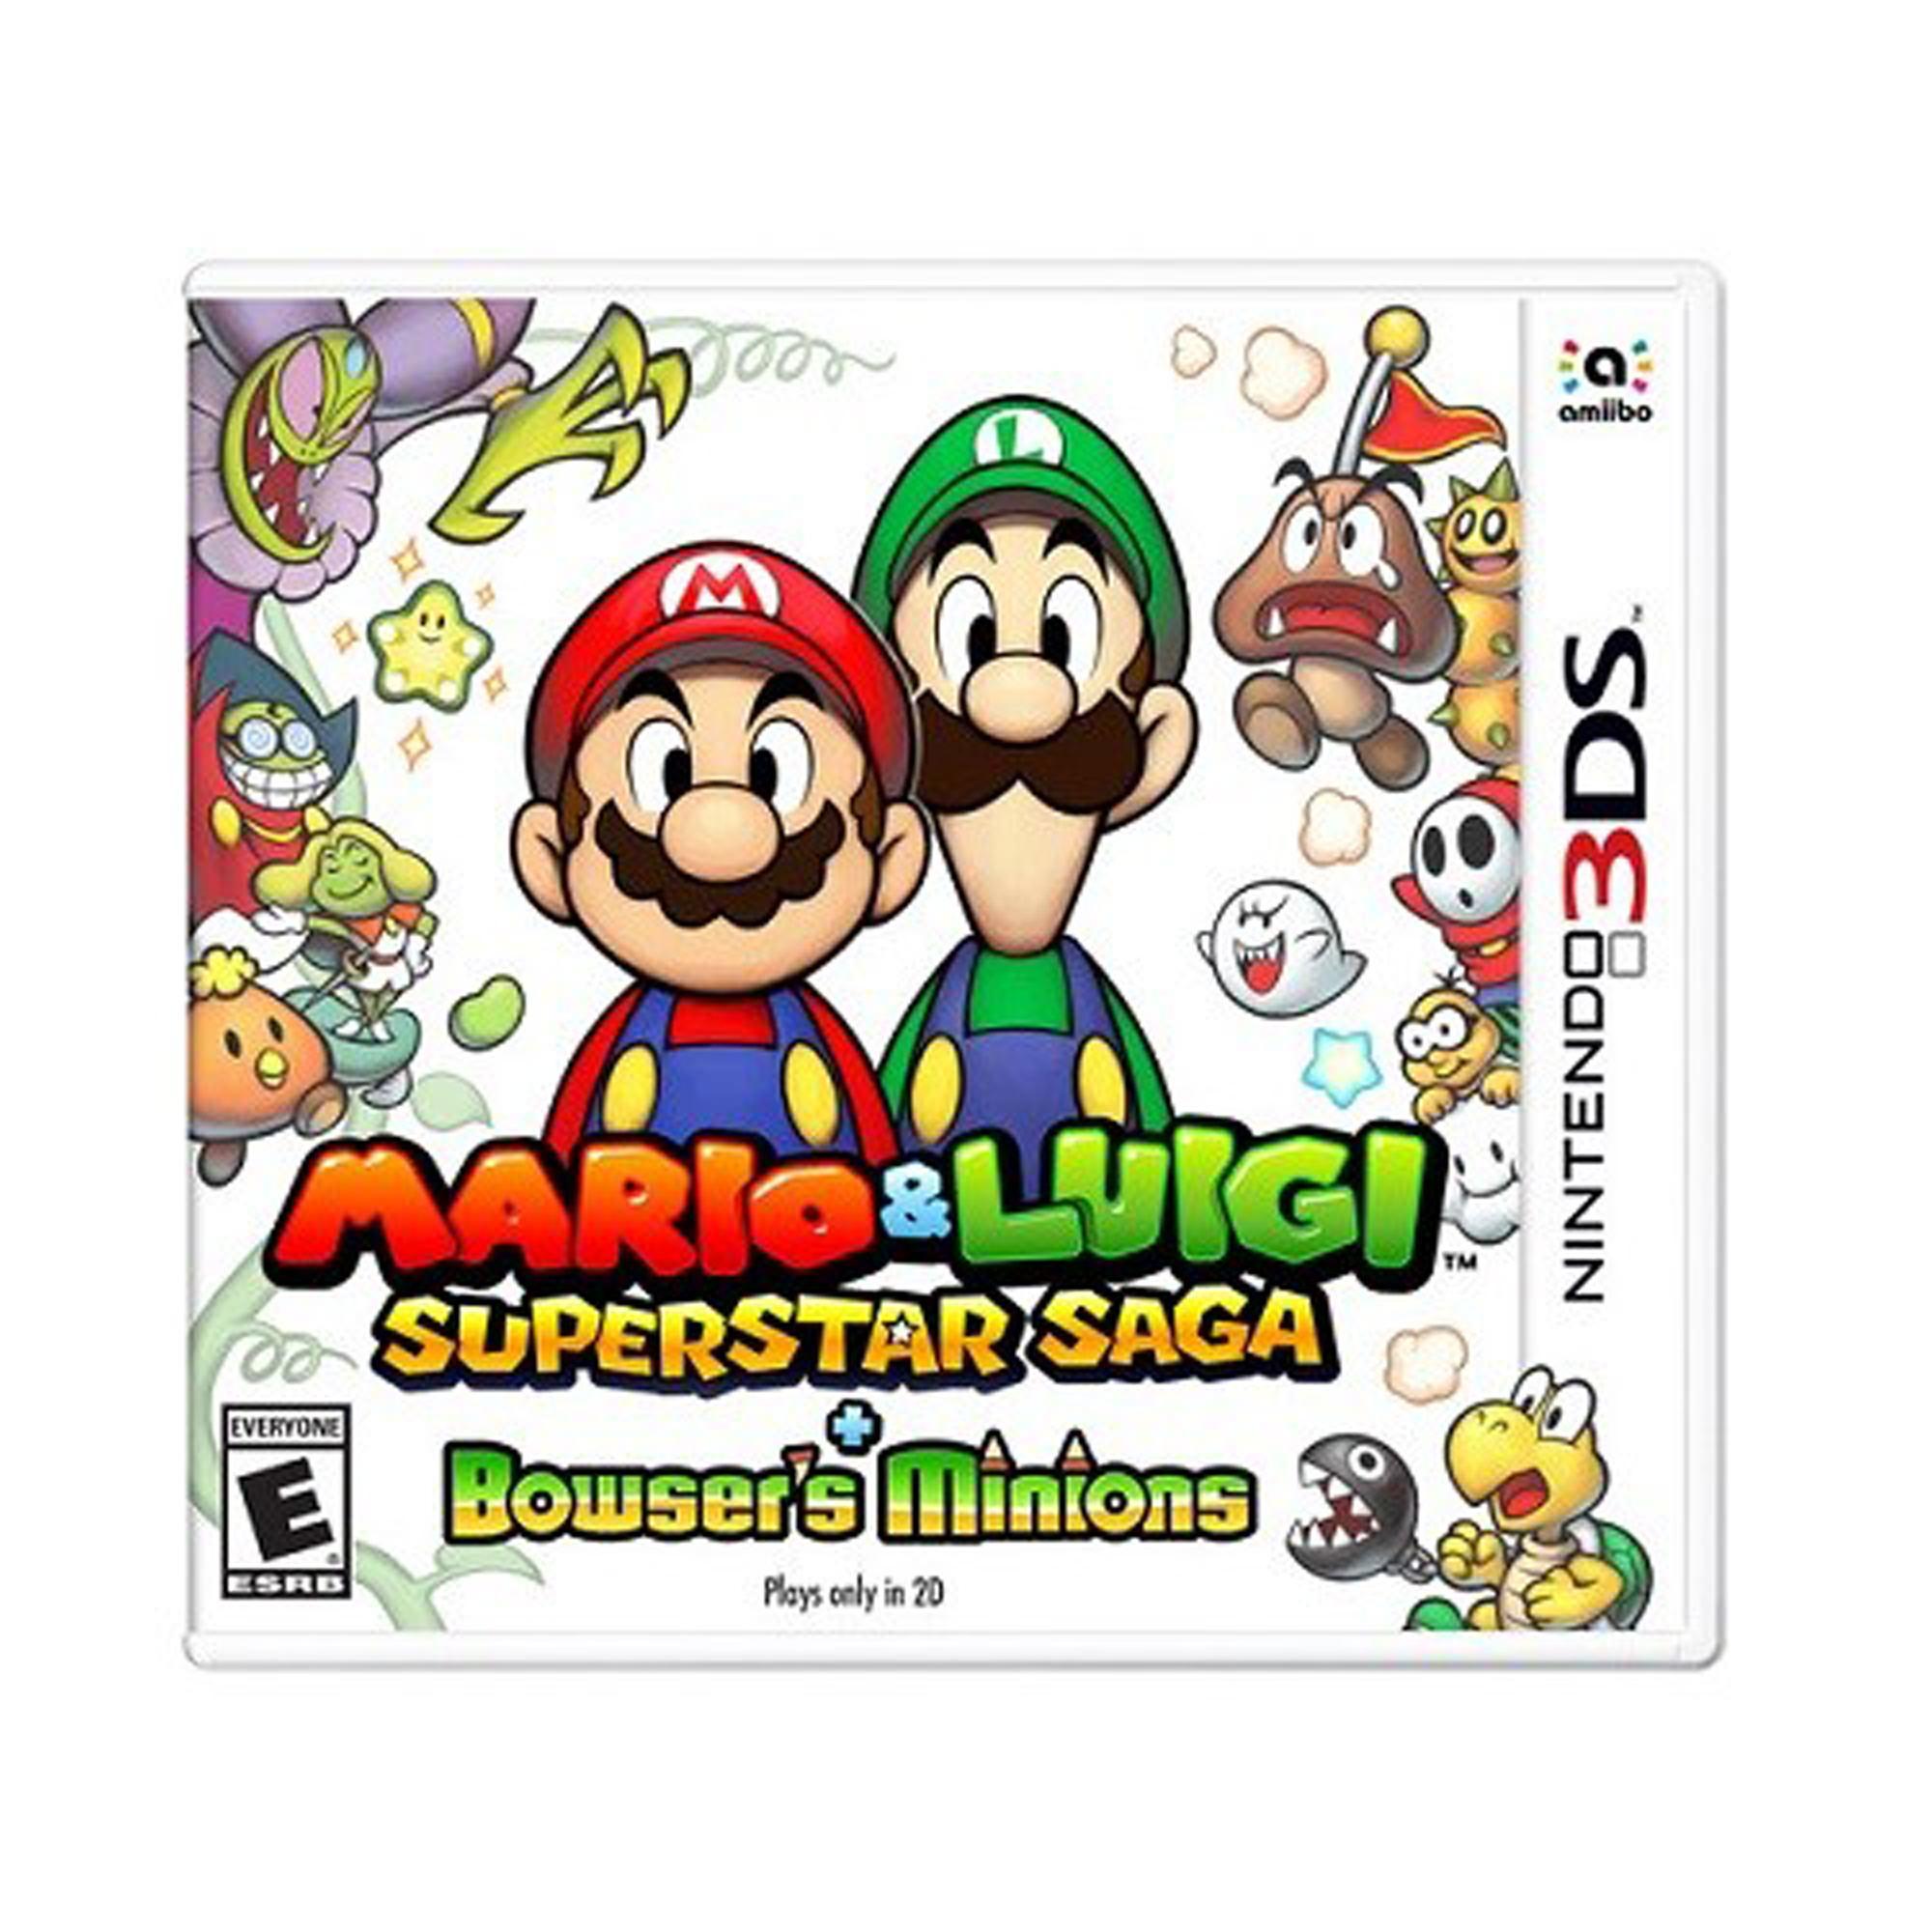 Mario & Luigi: superstar saga + Bowser's minions.